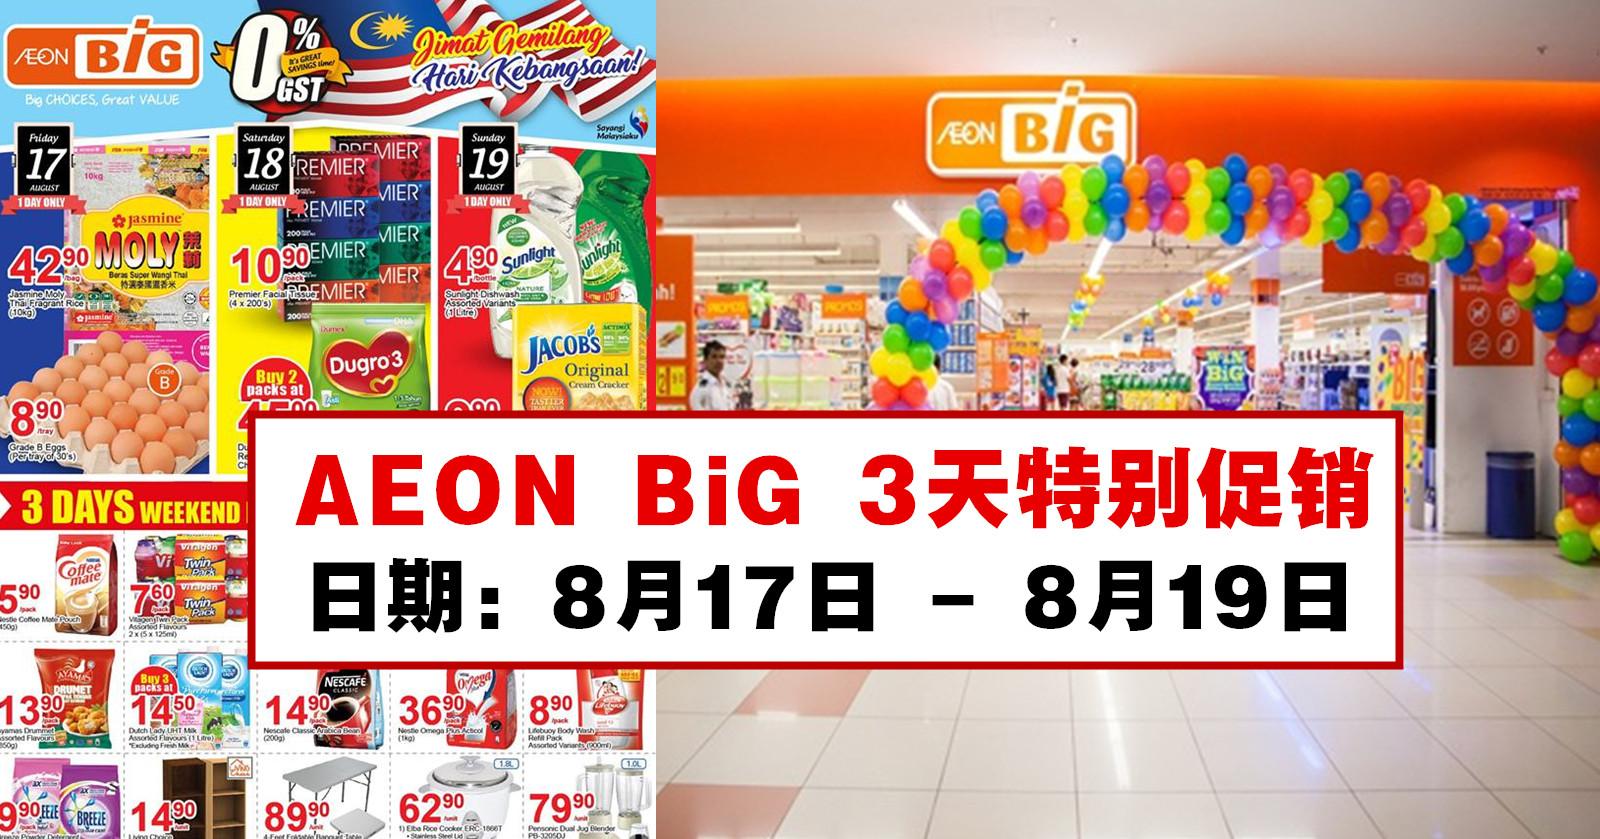 AEON BiG 3天特别促销